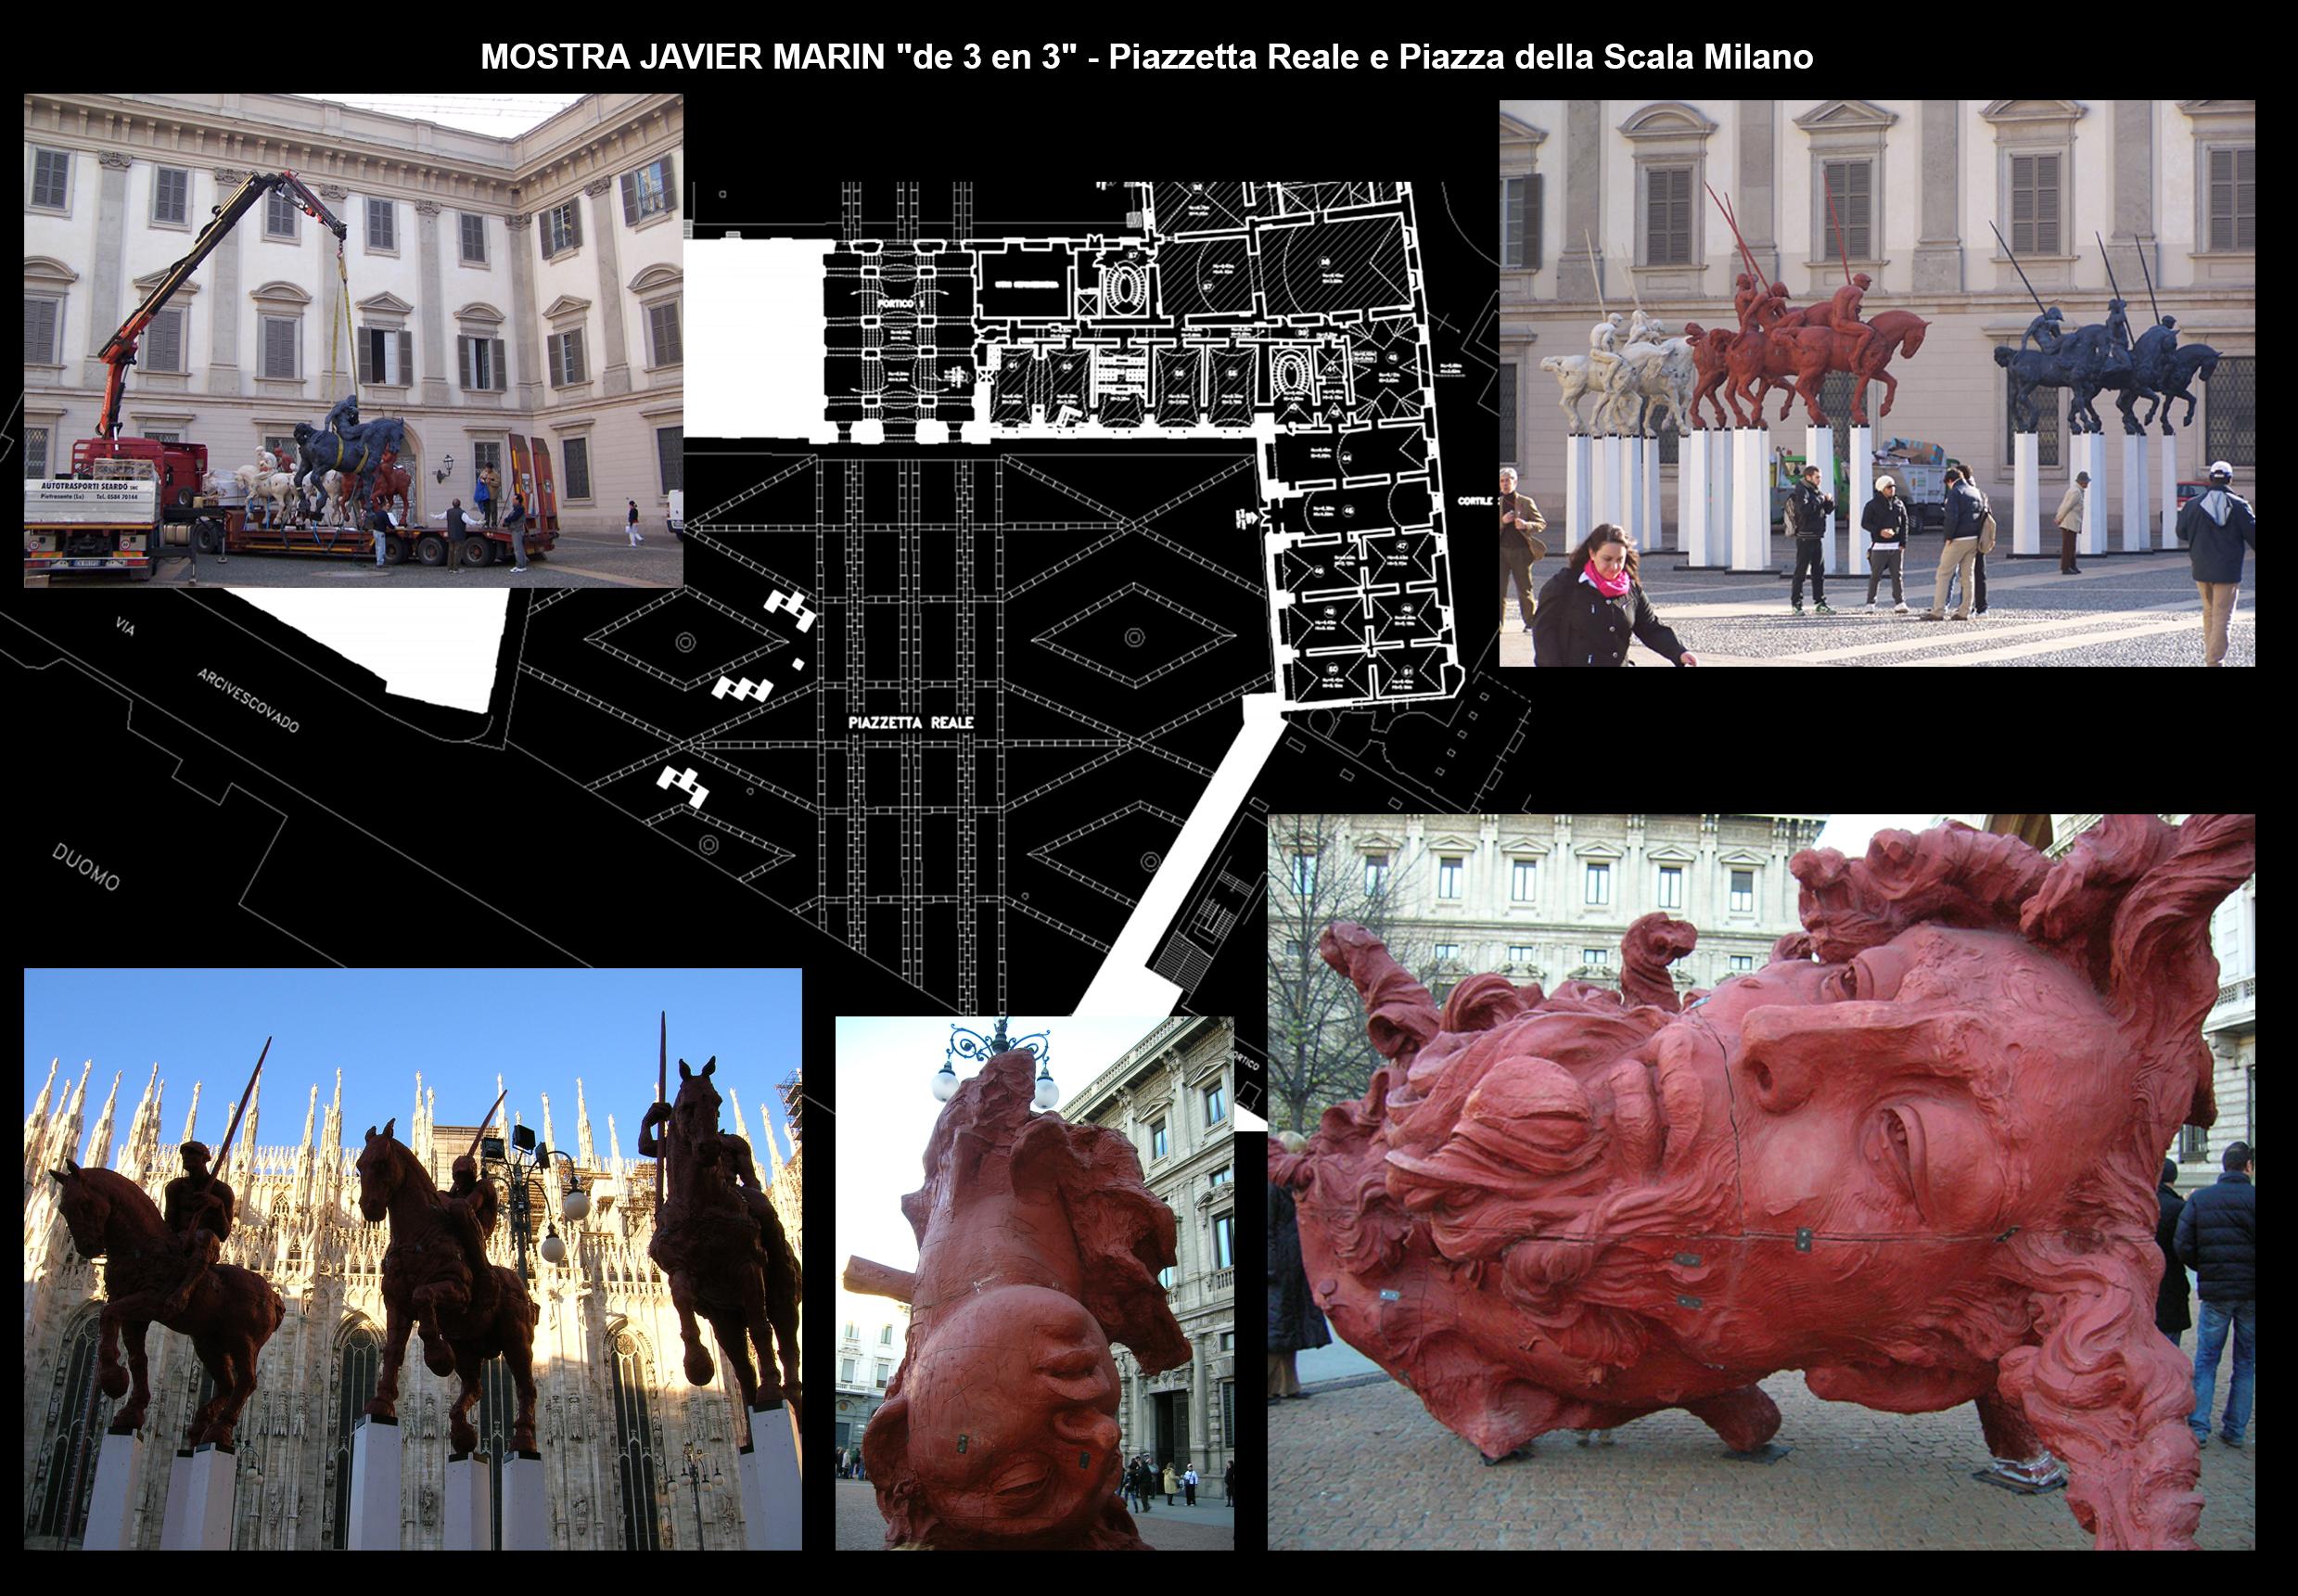 01_2008_MOSTRA-JAVIER-MARIN_Milano_PiazzatteRealeScala